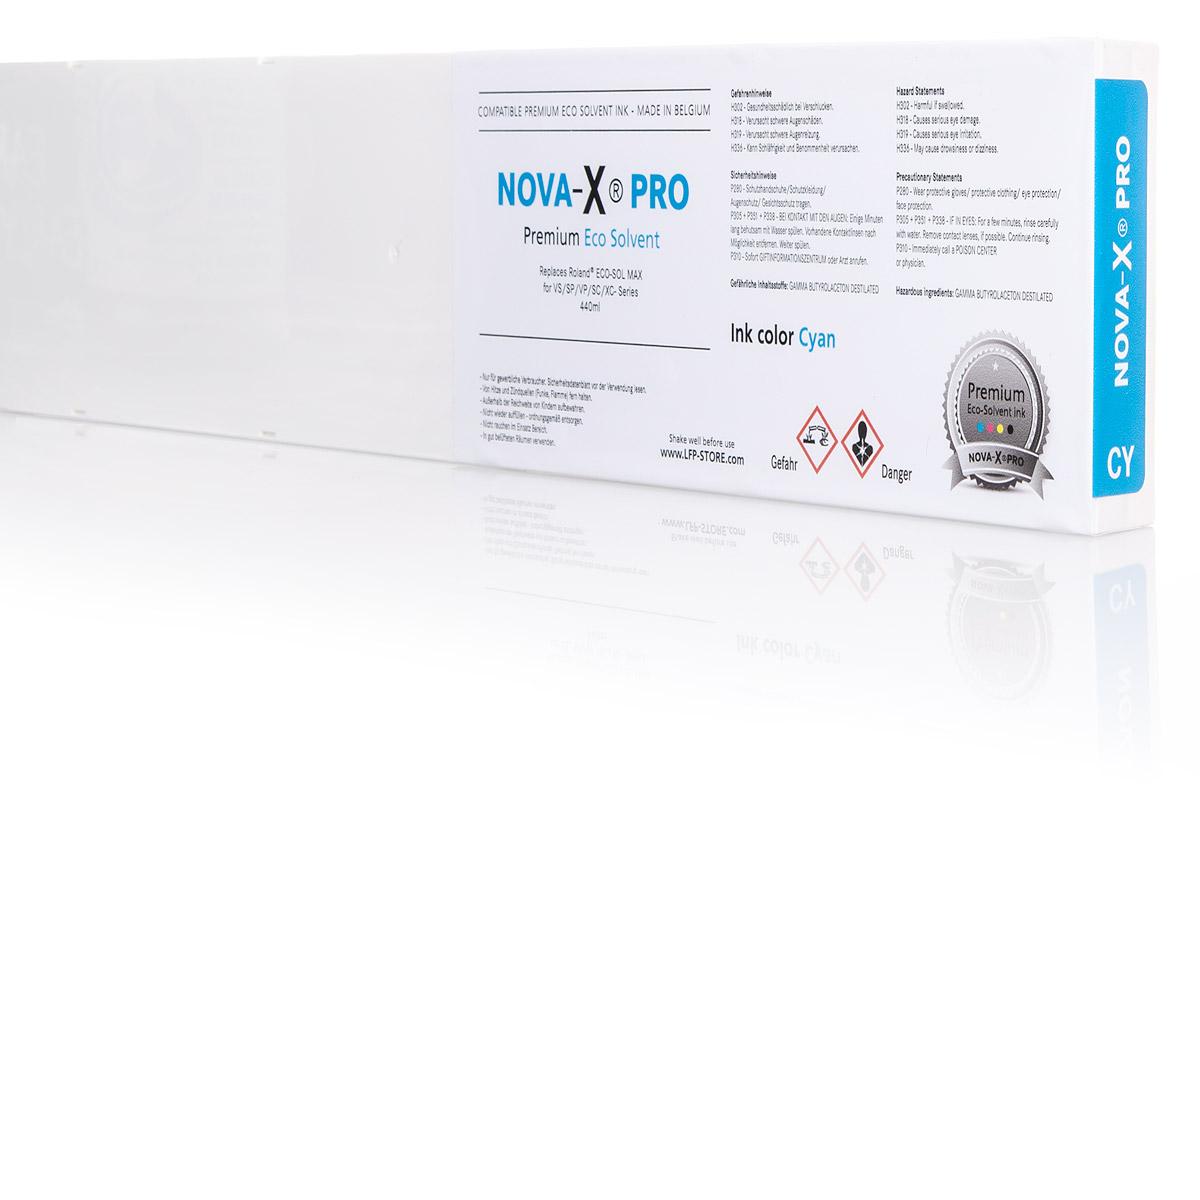 NOVA-X® PRO Tintenpatrone Eco-Solvent für Roland® | 440ml | OEM Farbanpassung